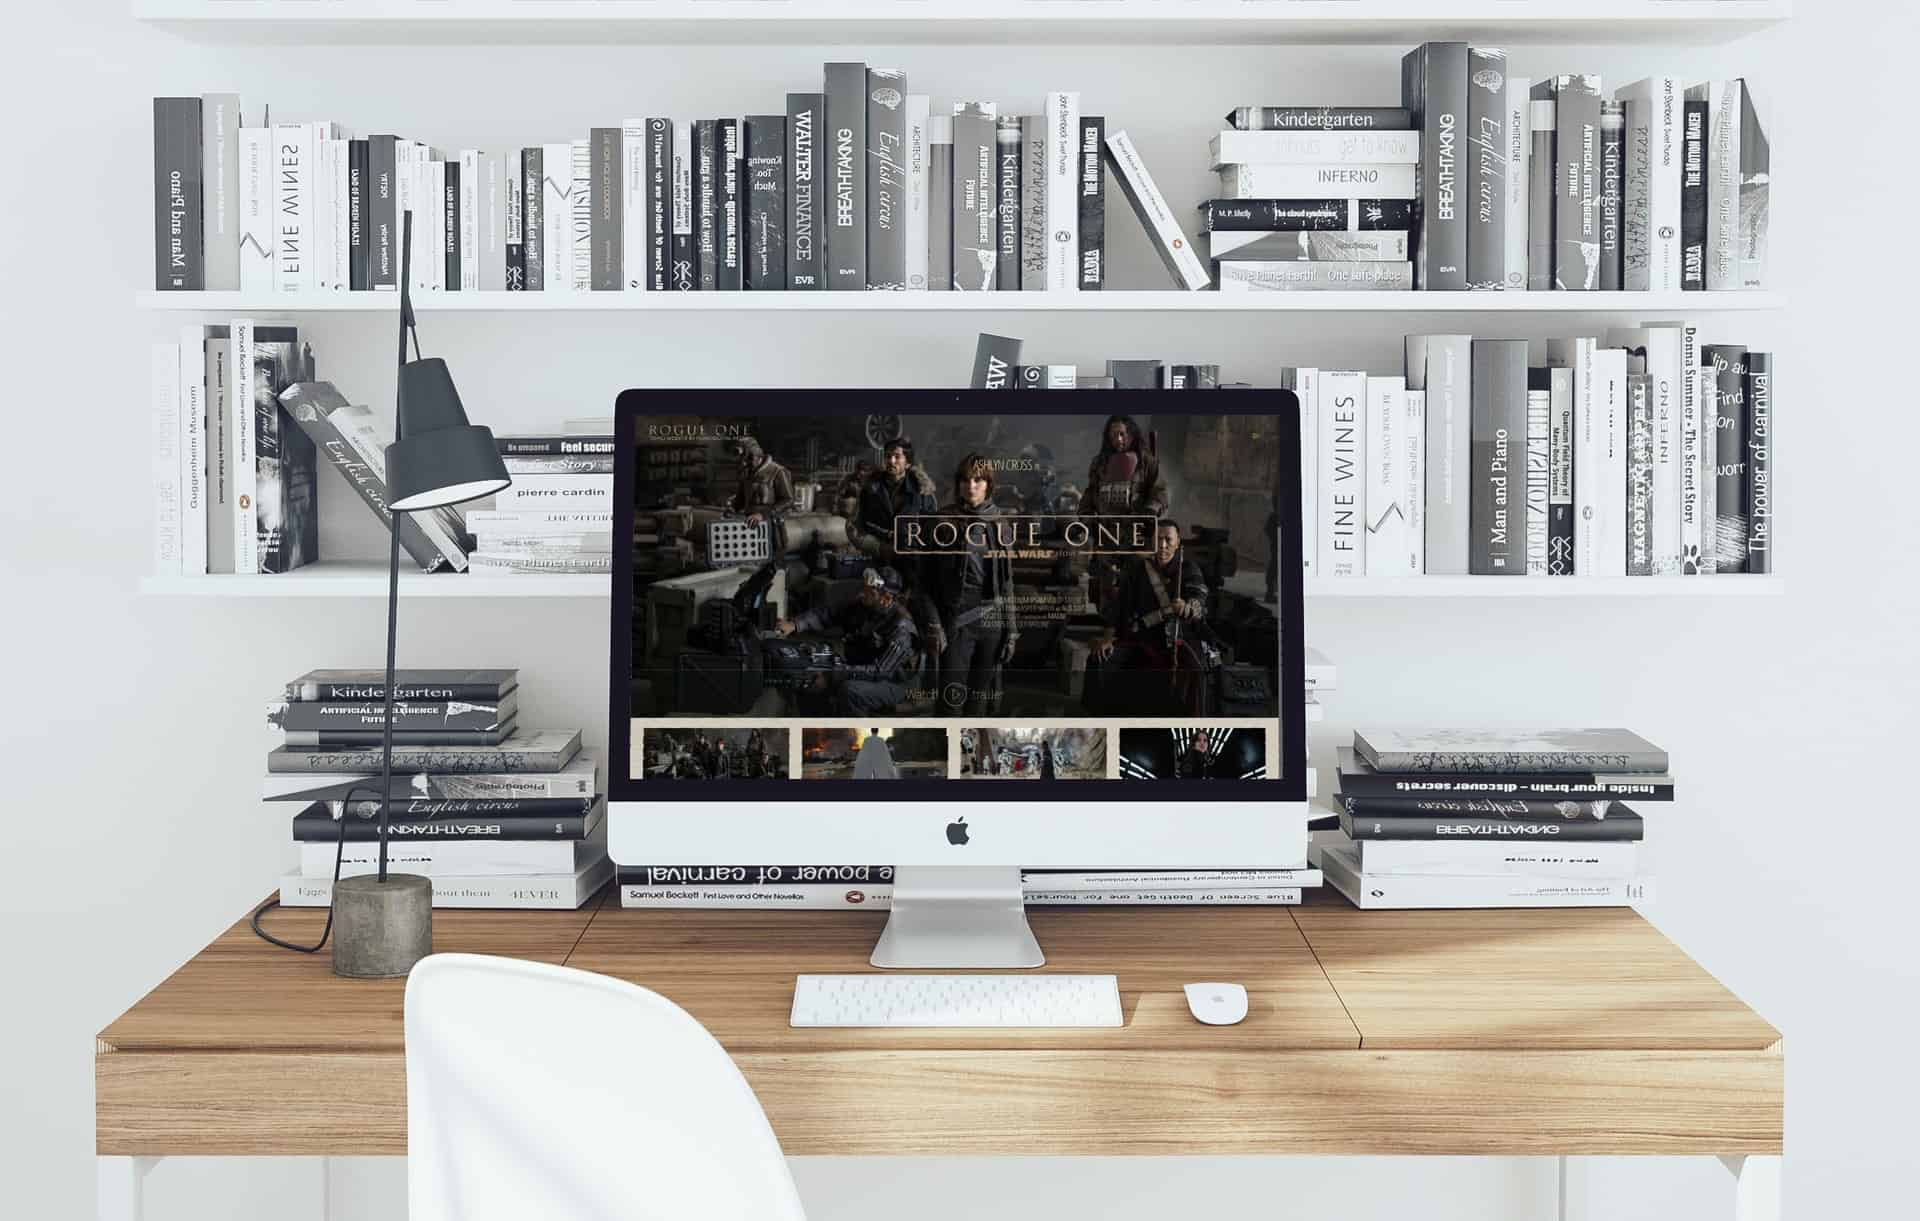 Movie web design and digital marketing for Film and TV - web design Birmingham by Huxo Creative